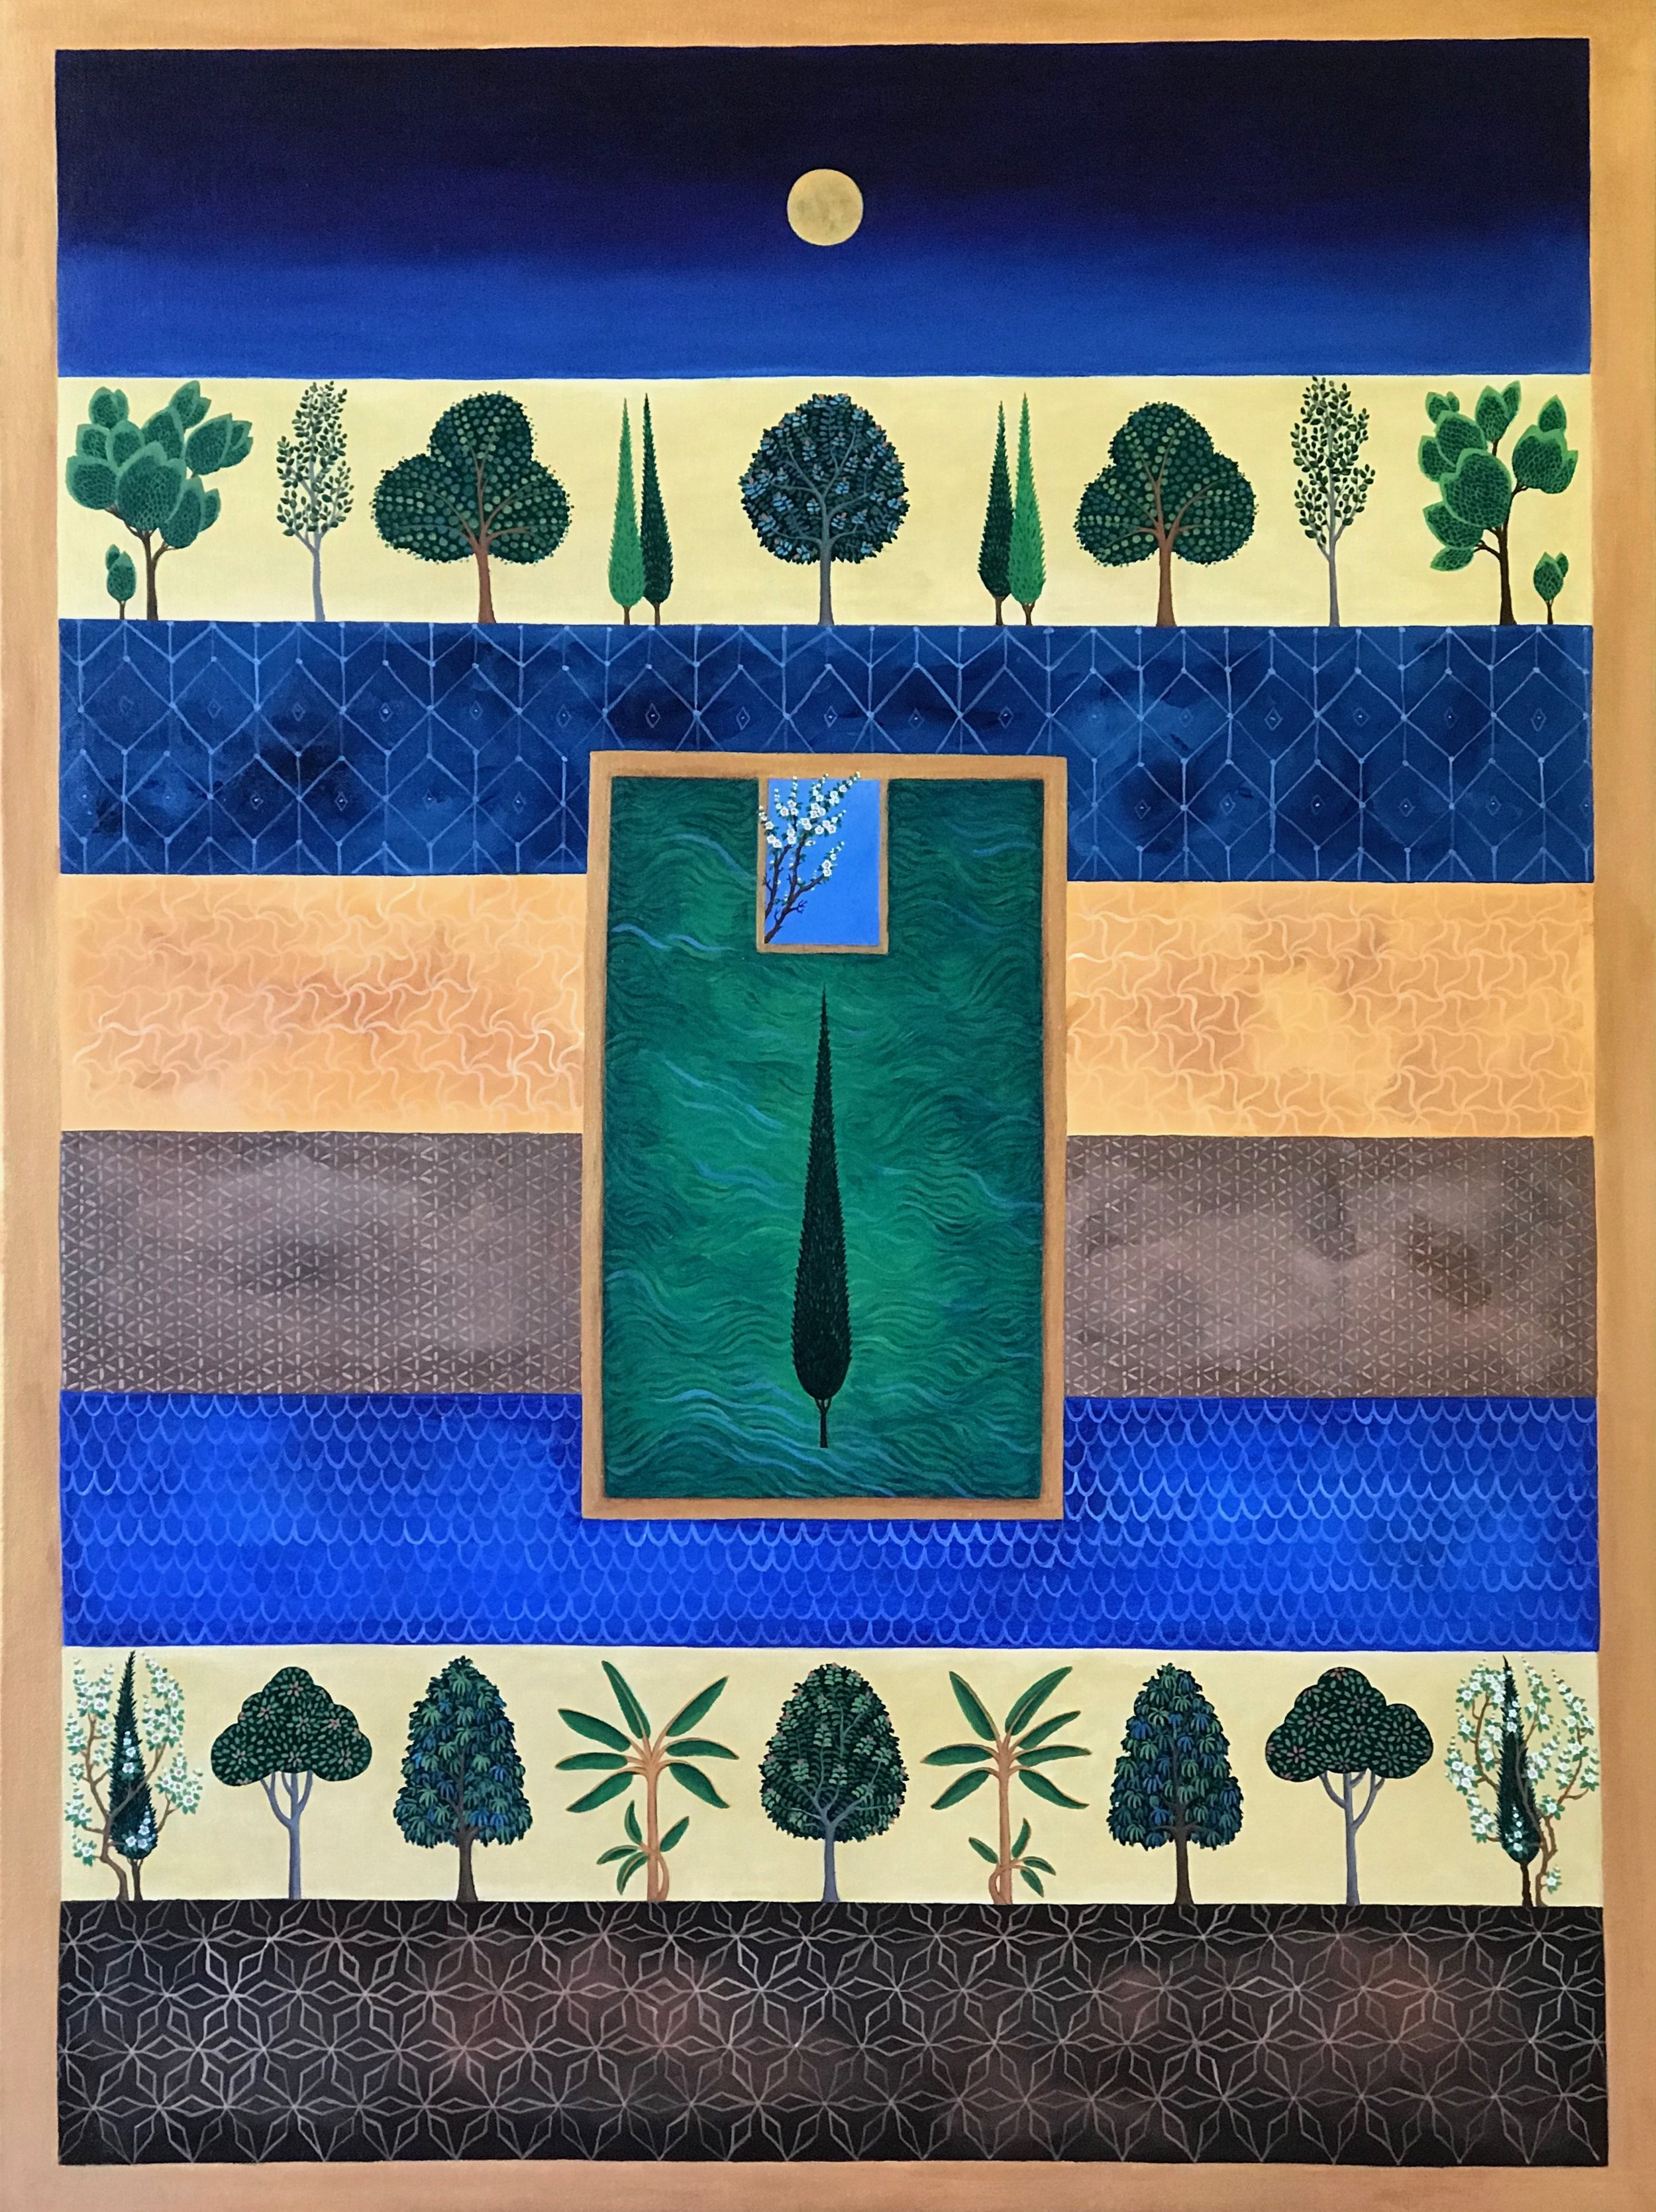 treeline garden, 30''x40'', acrylic on canvas, 2018.